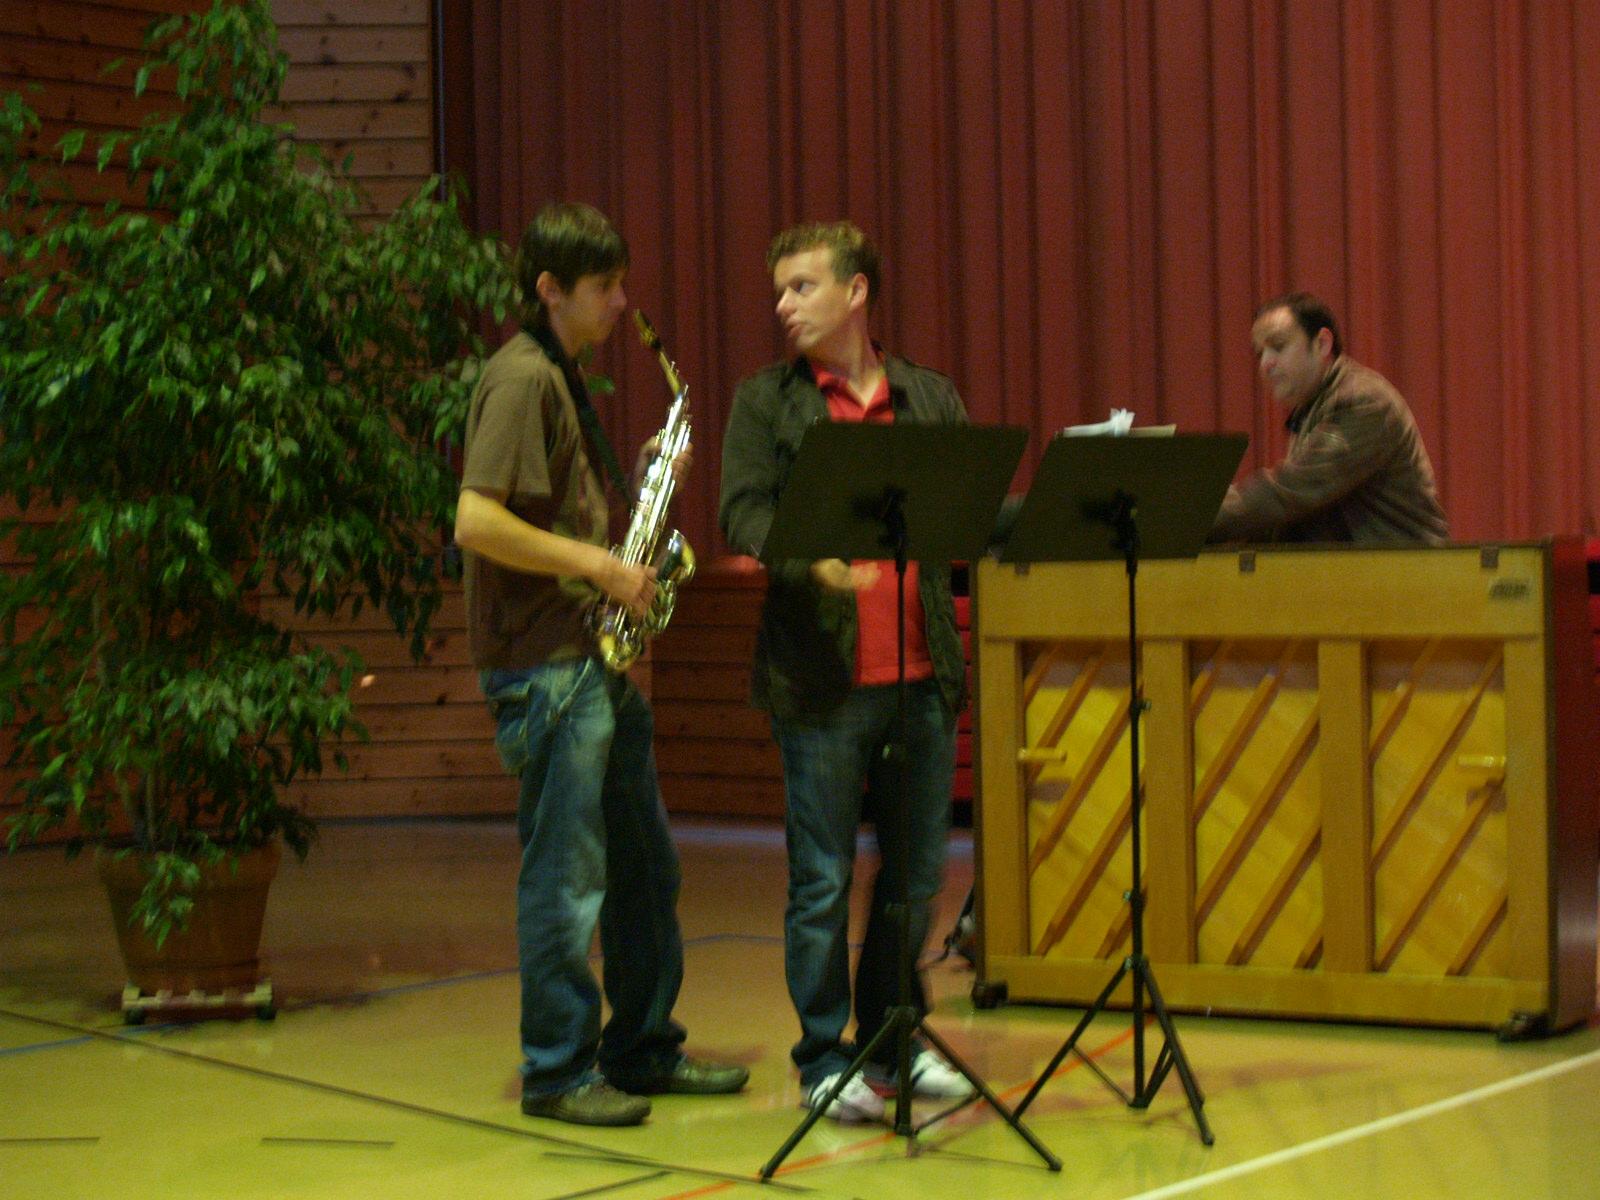 Solistenwettbewerb 2007 - Rüthi